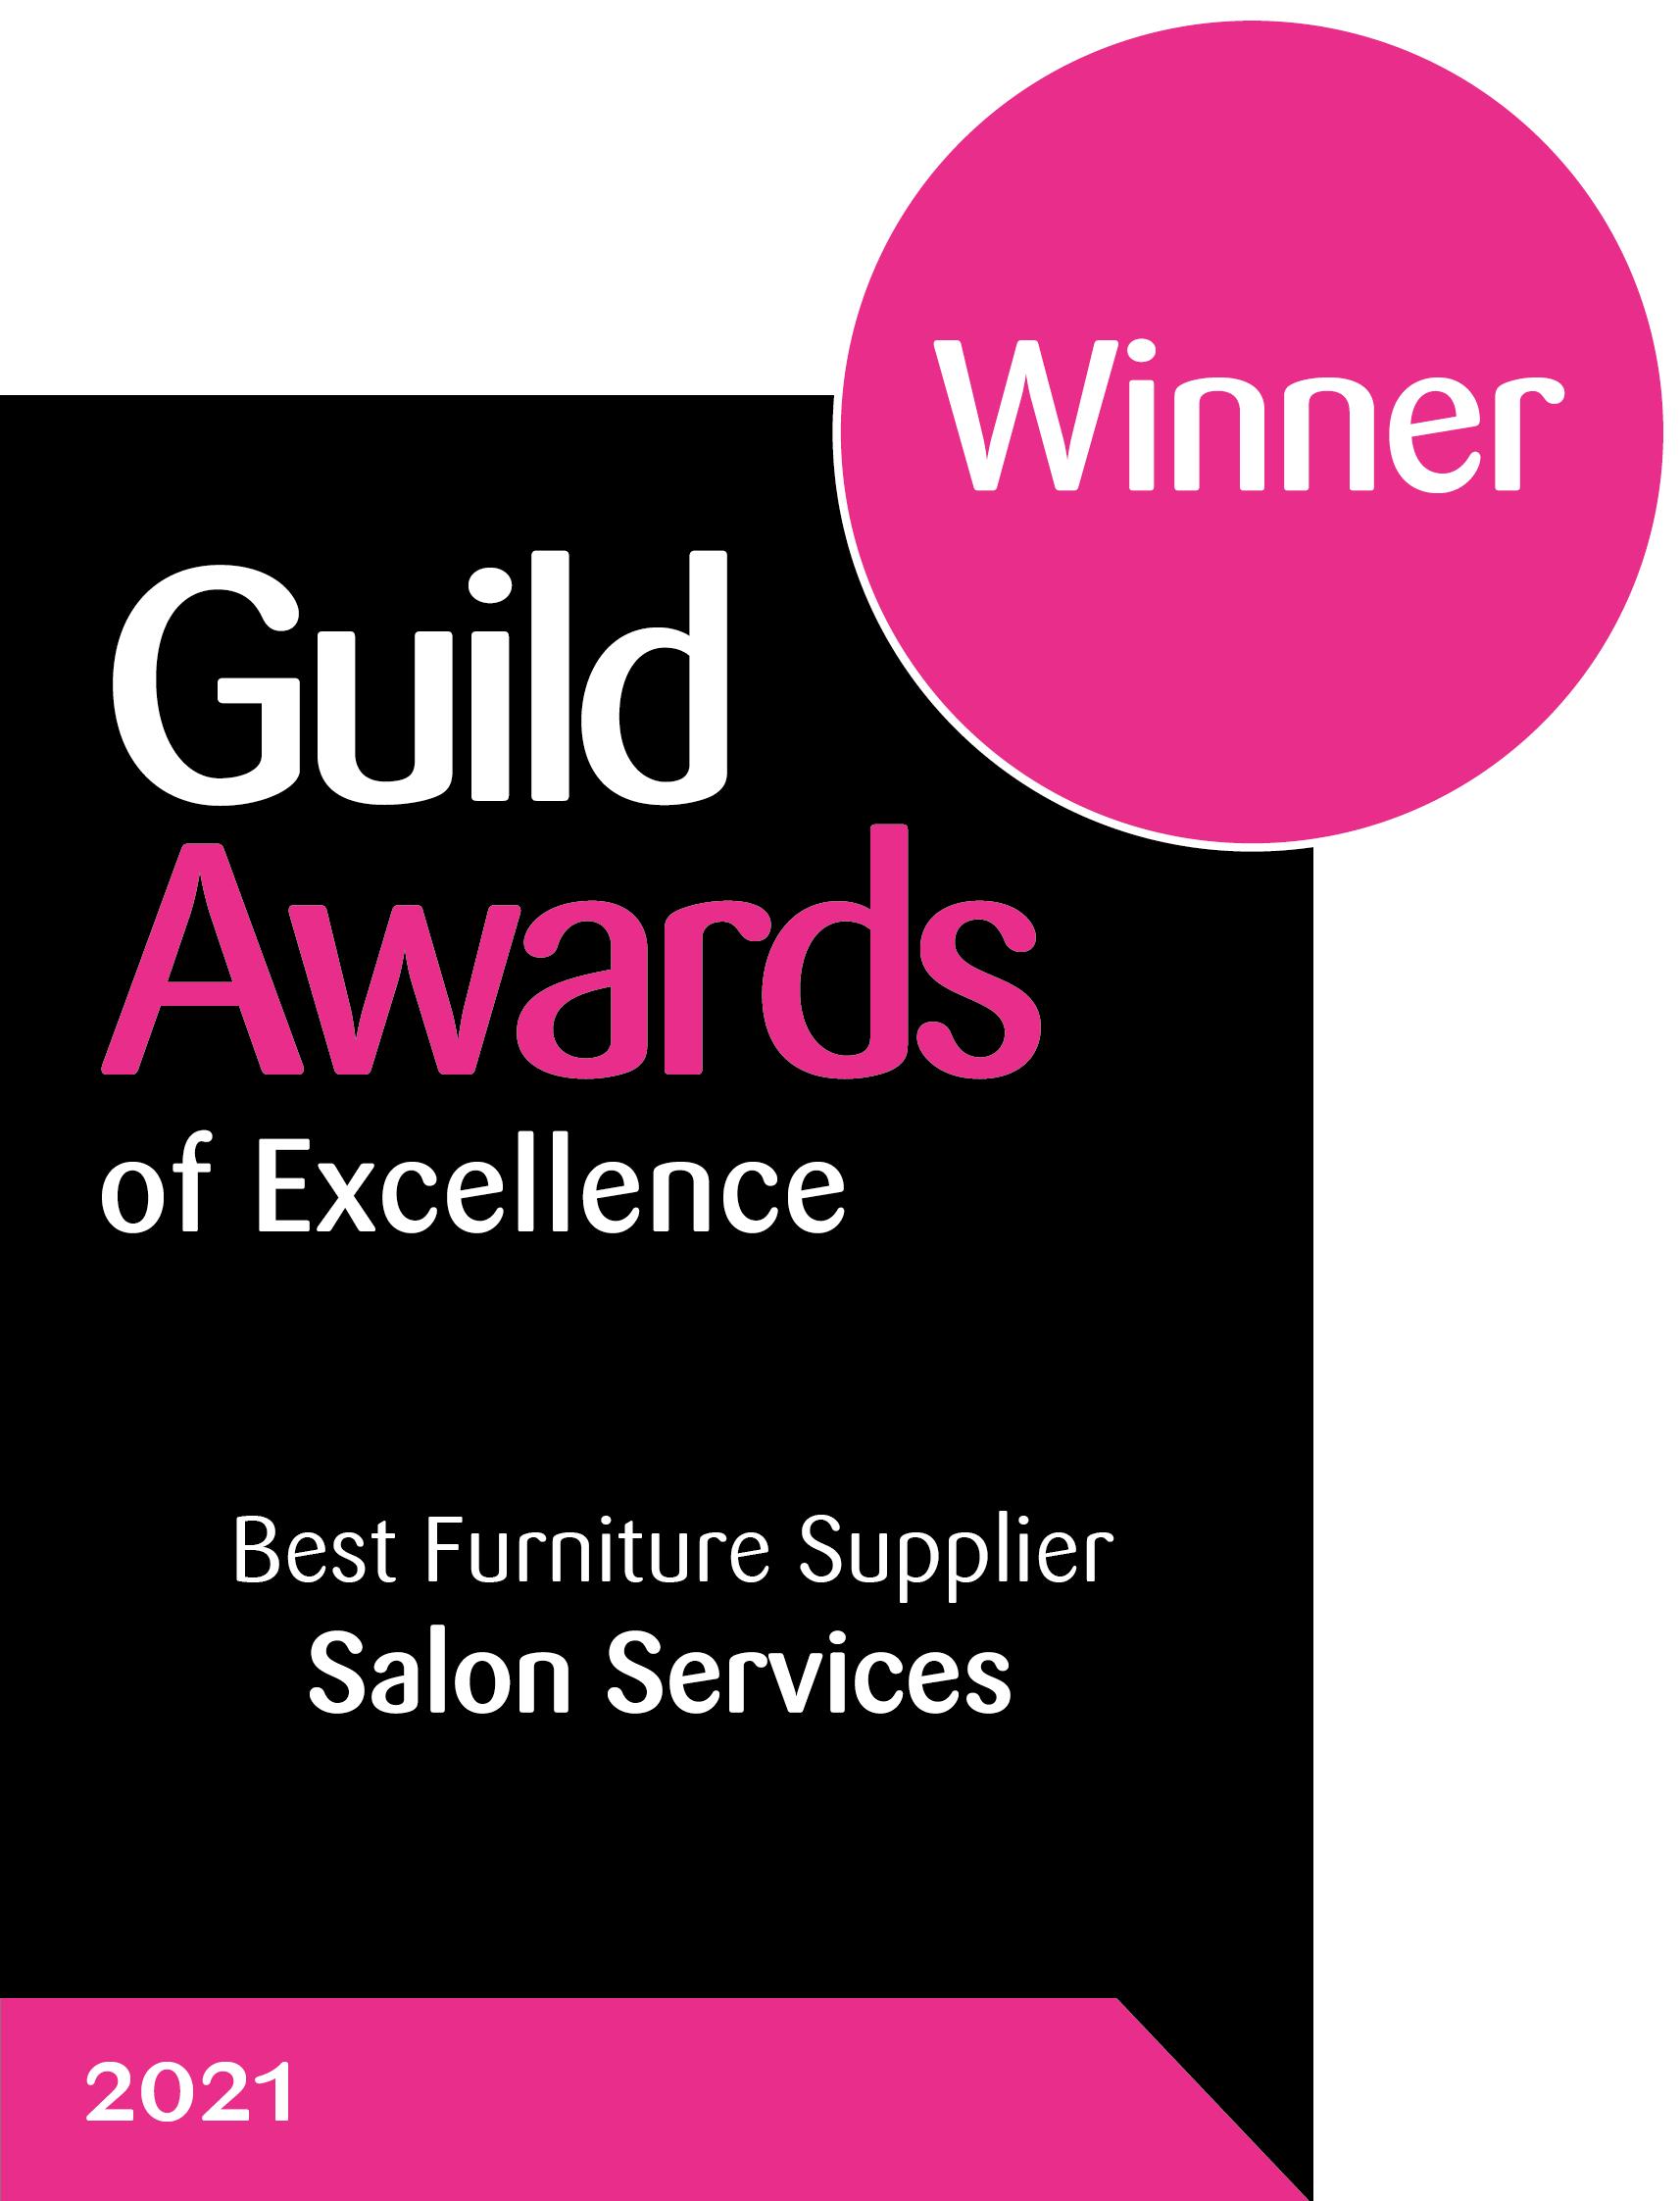 guild awards image 1